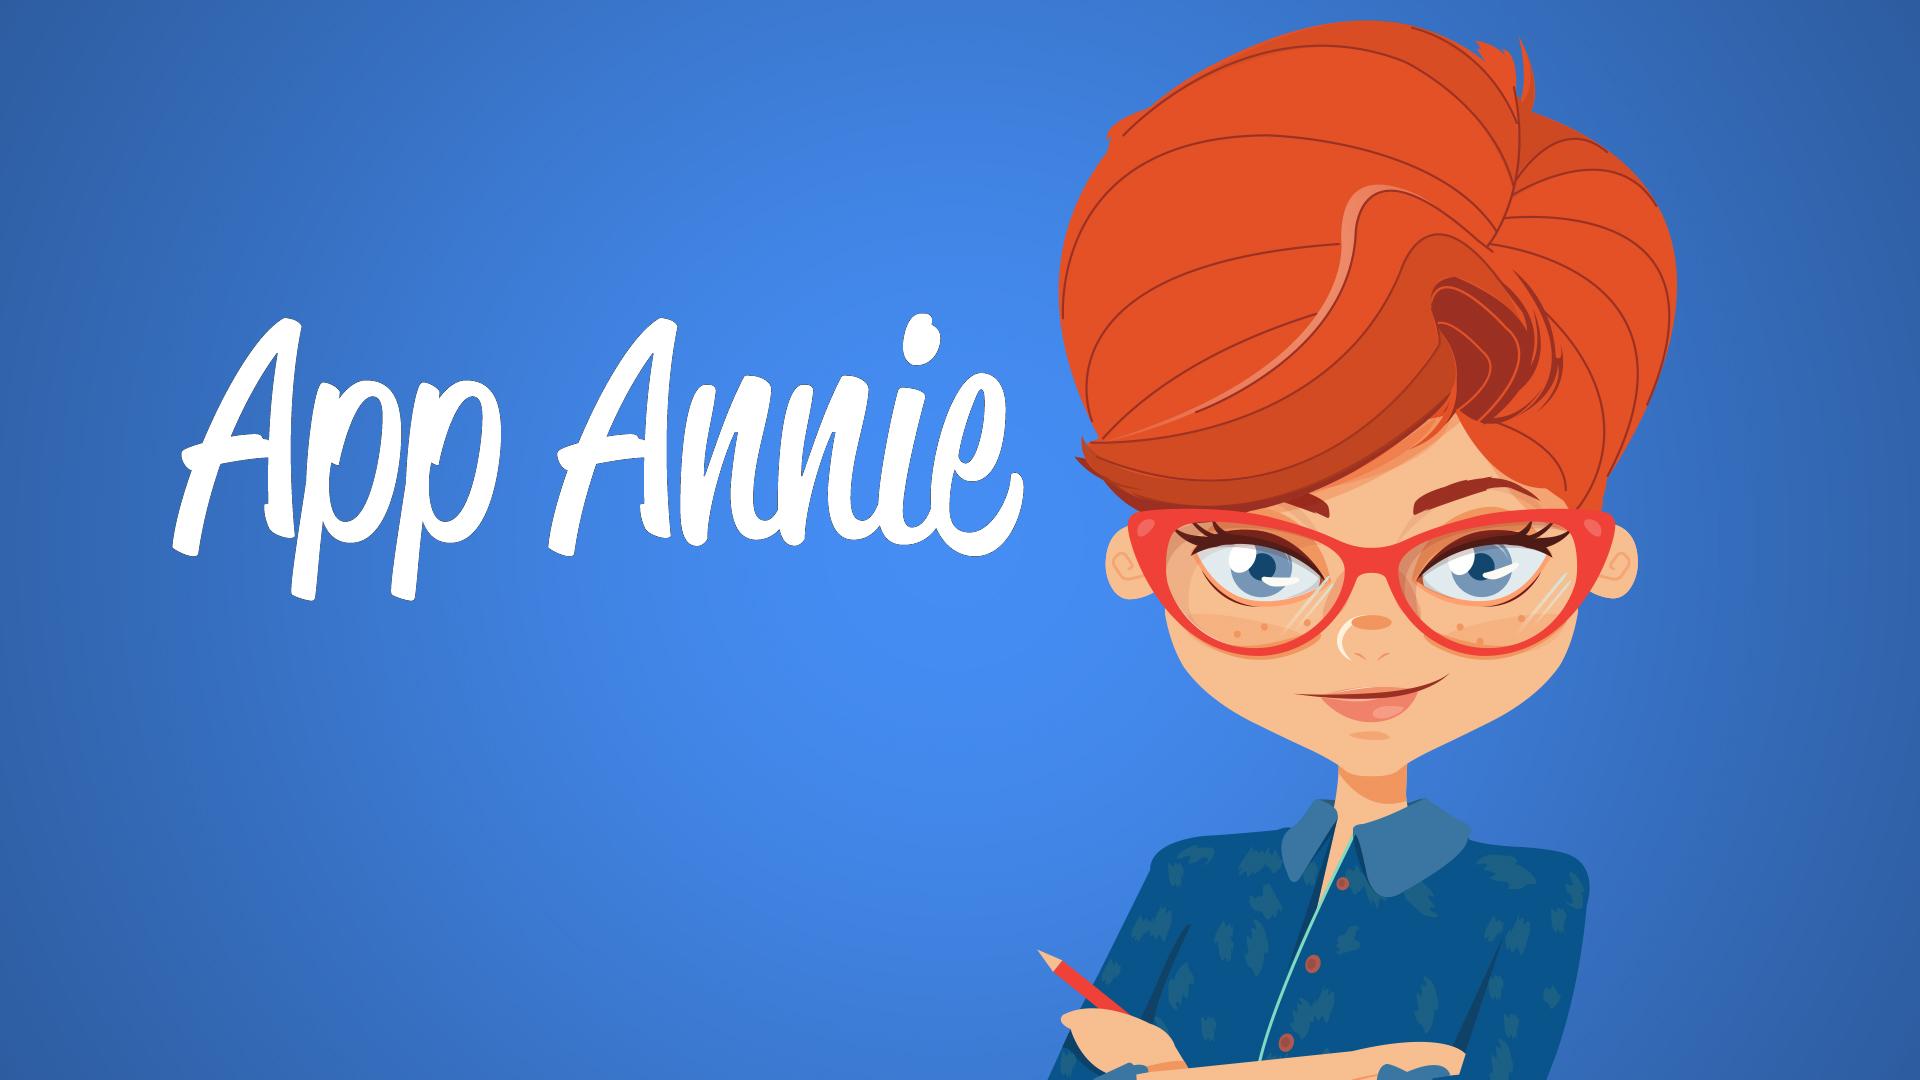 koukku apps Intia vakava dating sites Montreal